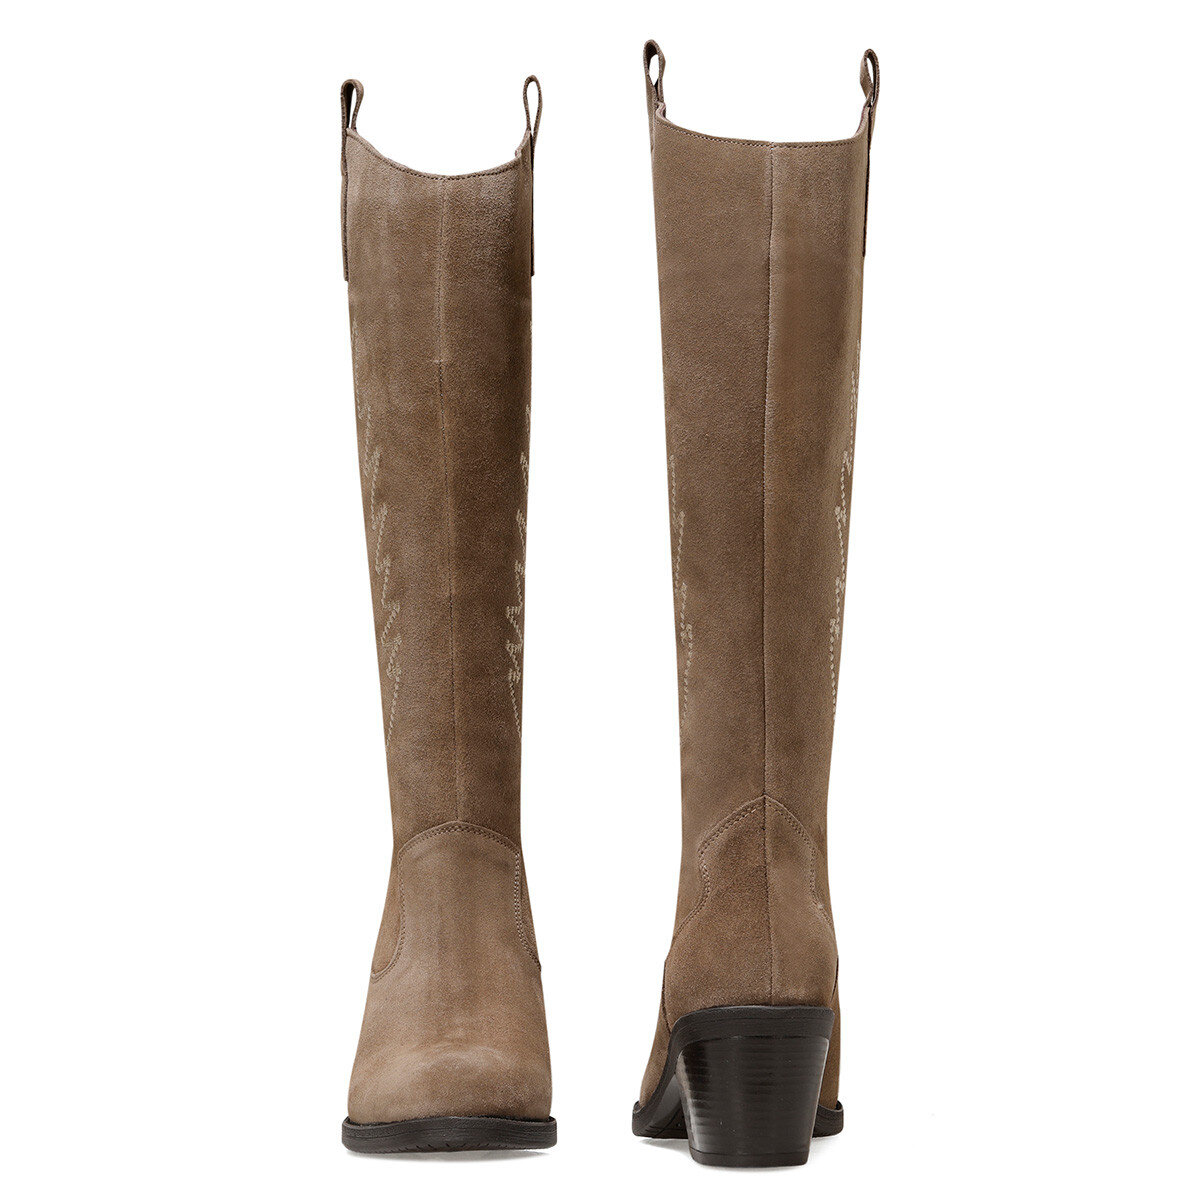 COSME2 Vizon Kadın Topuklu Çizme